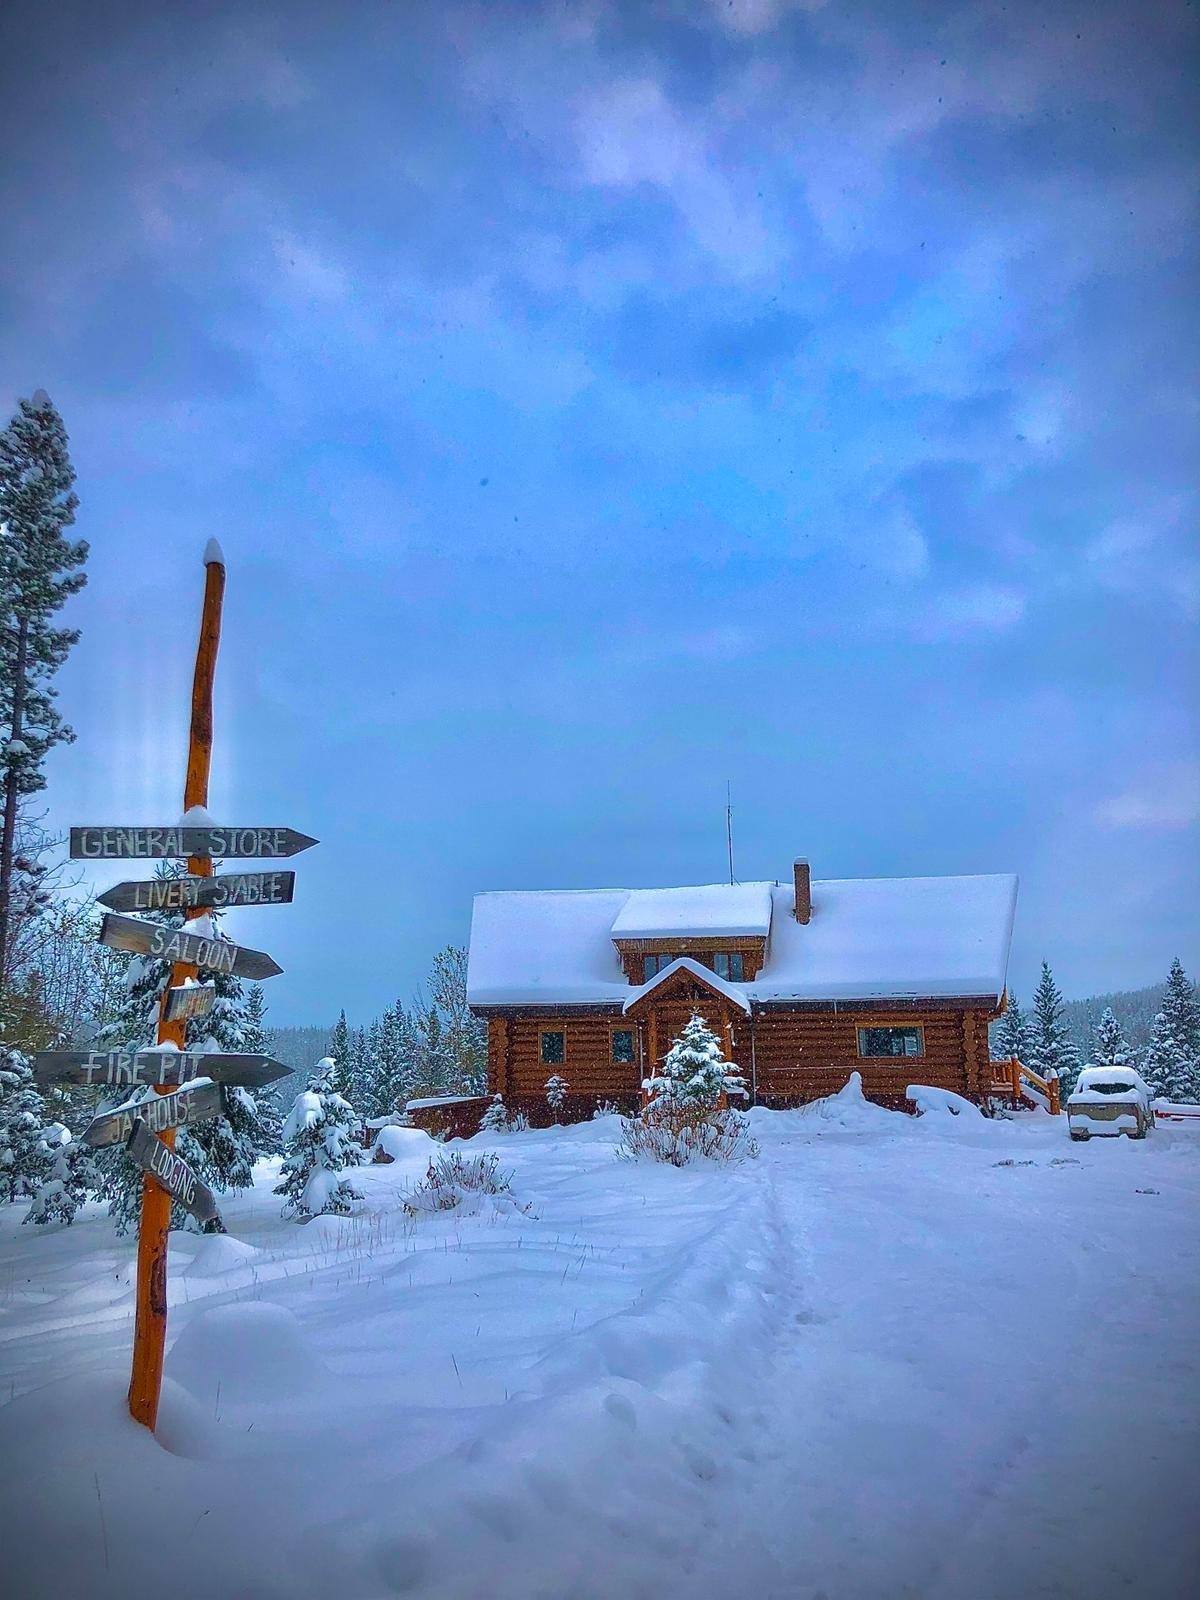 Big Creek Lodge: Christmas & New Year ranching deal in Canada